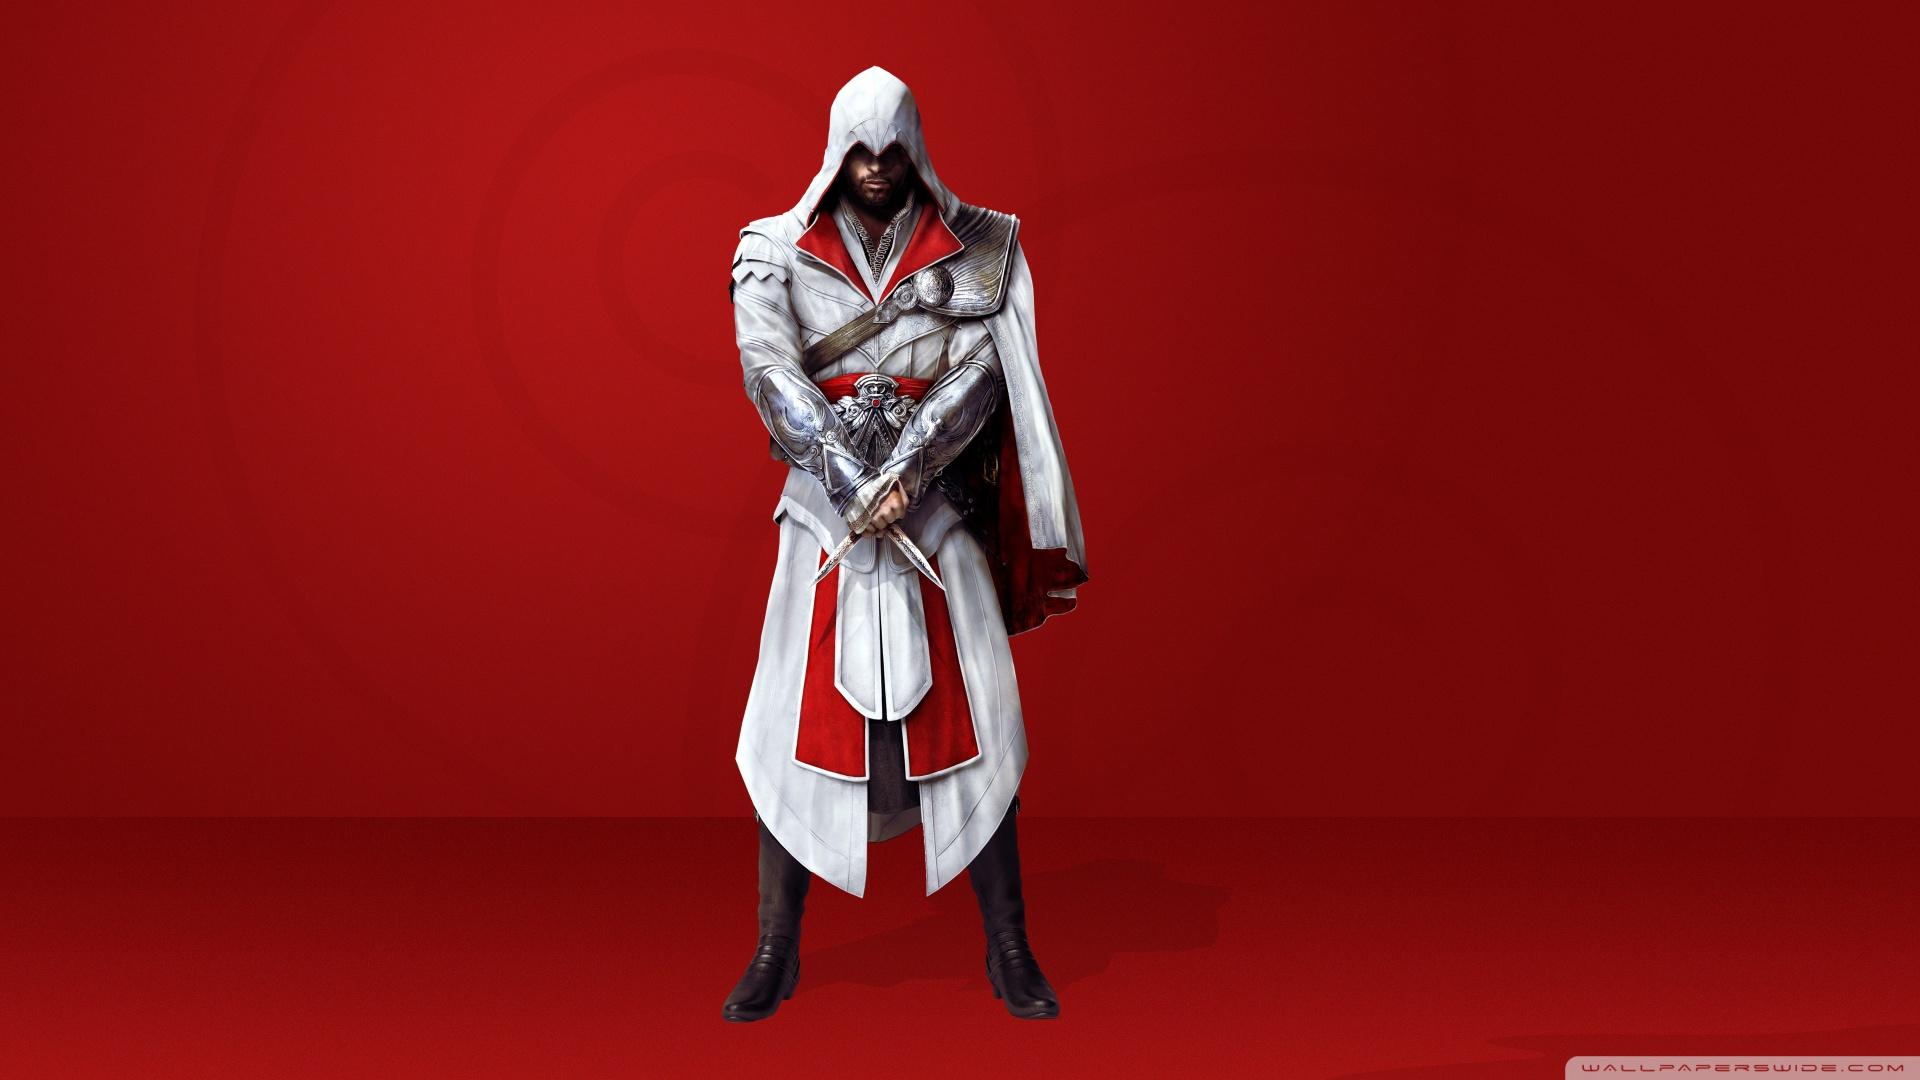 Assassins Creed Brotherhood 3 Wallpaper 1920x1080 Assassins Creed 1920x1080